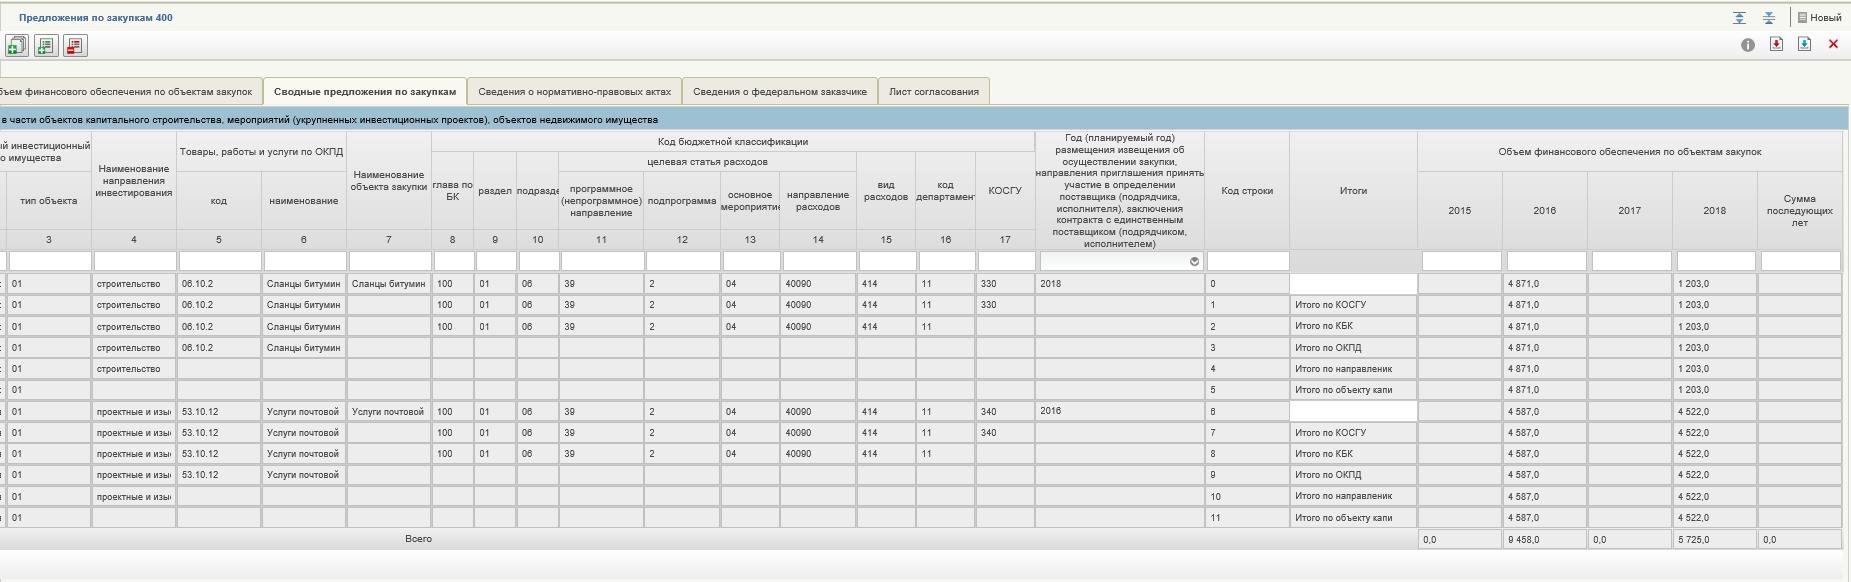 для чего предназначена таблица ascii